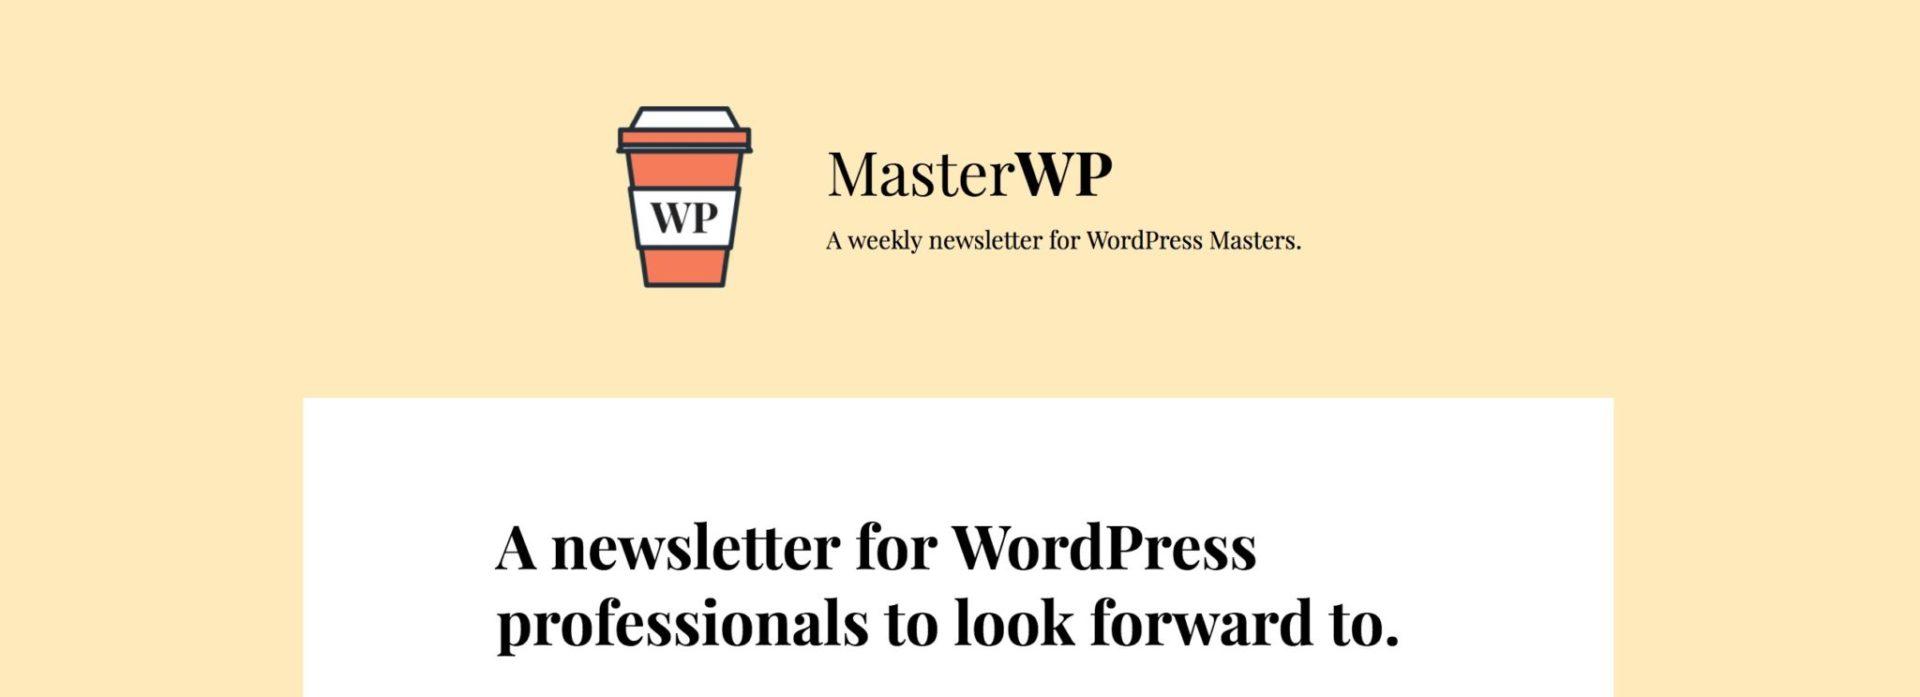 MasterWP newsletter